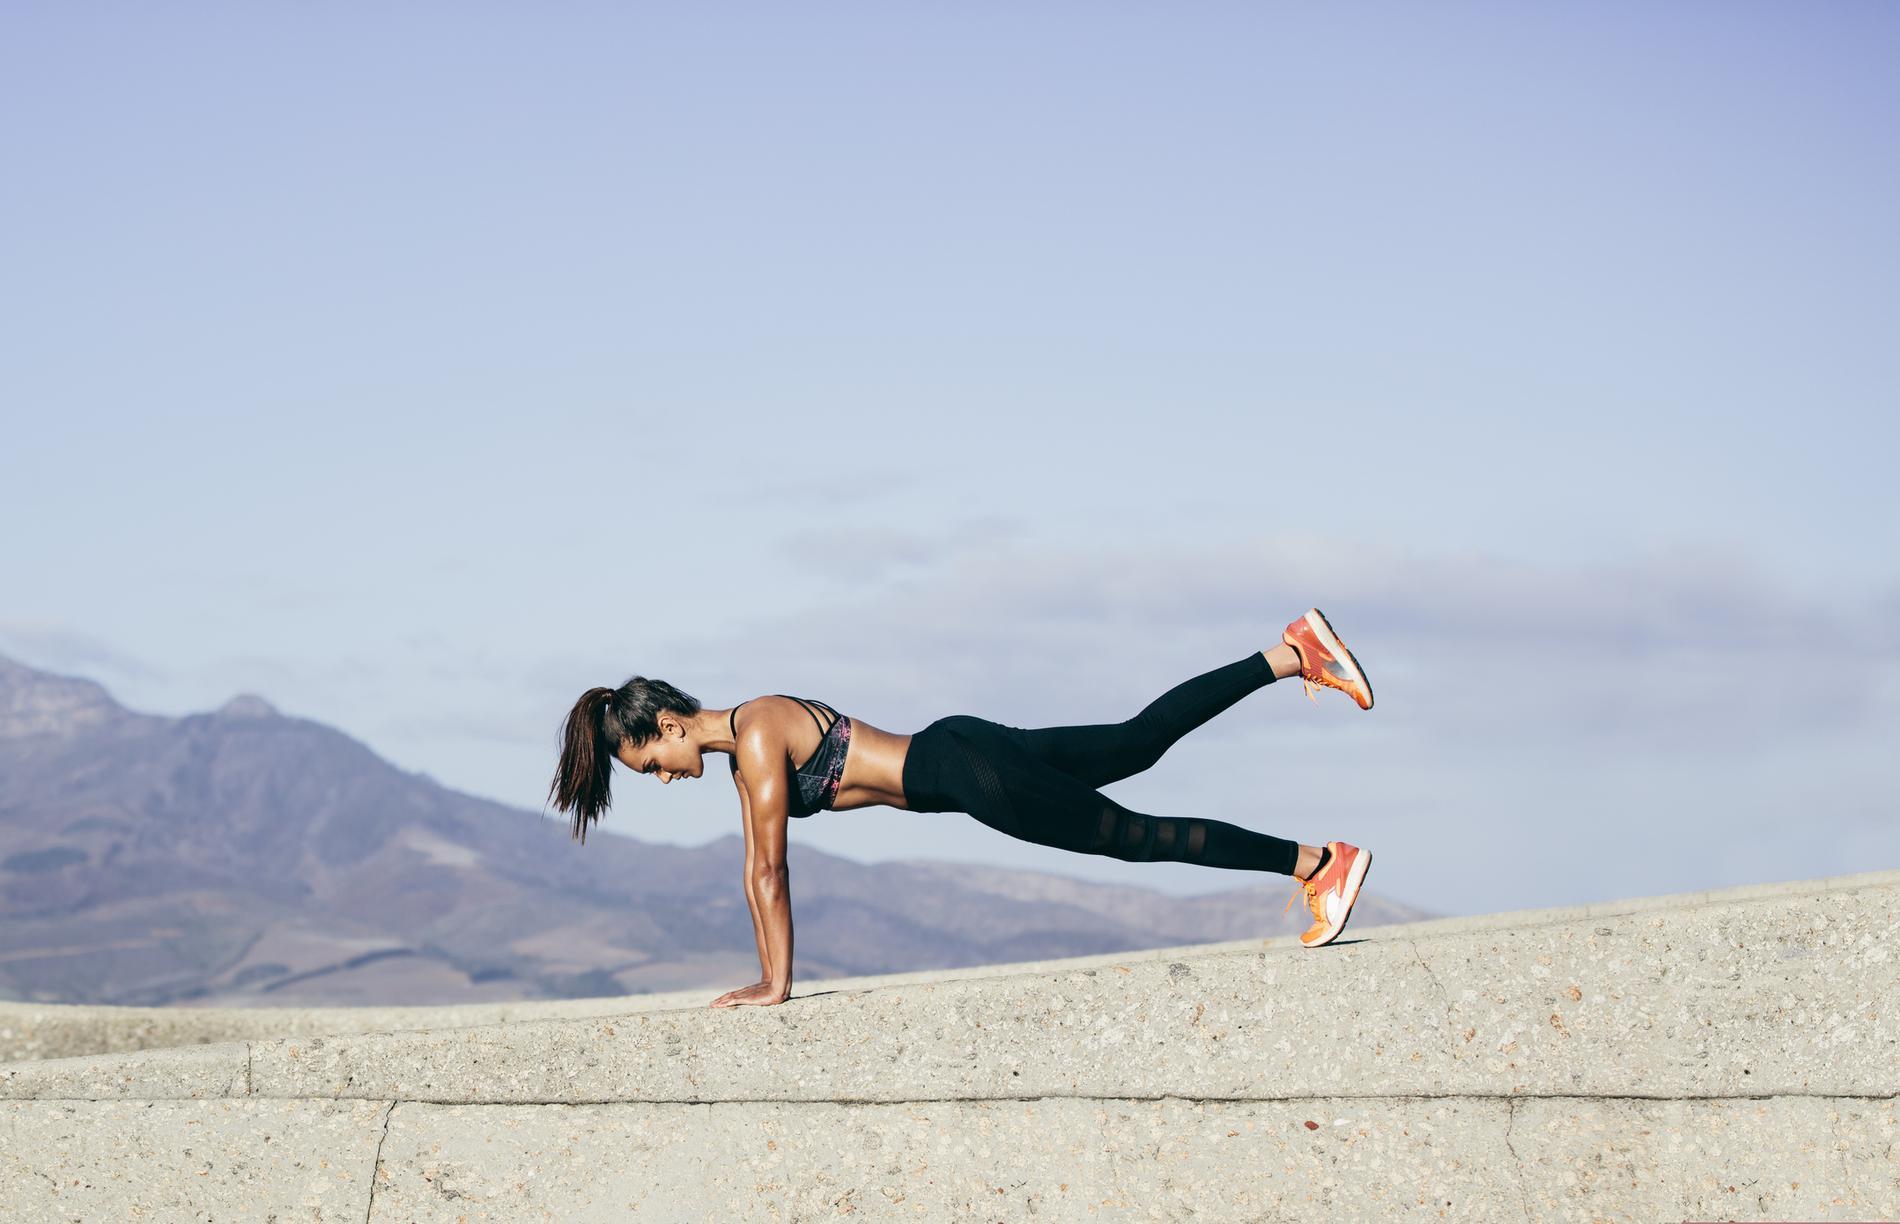 planche sur une jambe pour runneuse : musculation des jambes